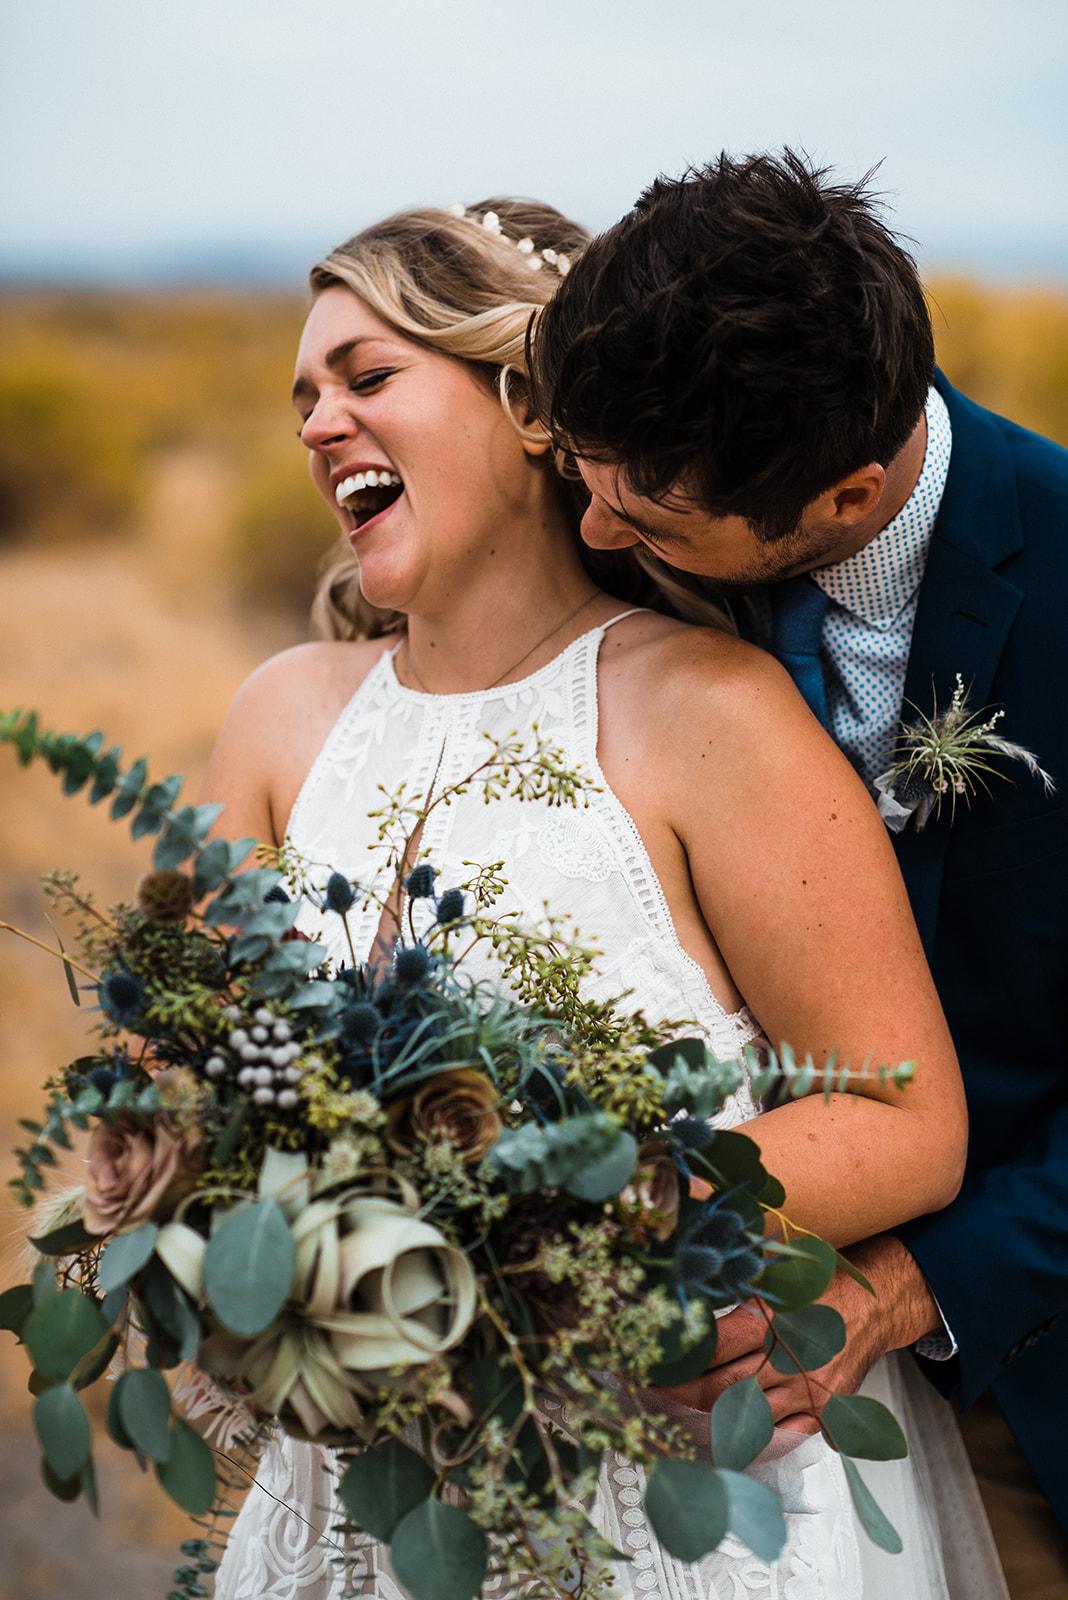 Madison_Guy_Wedding_The_Foxes_Photography_113.jpg